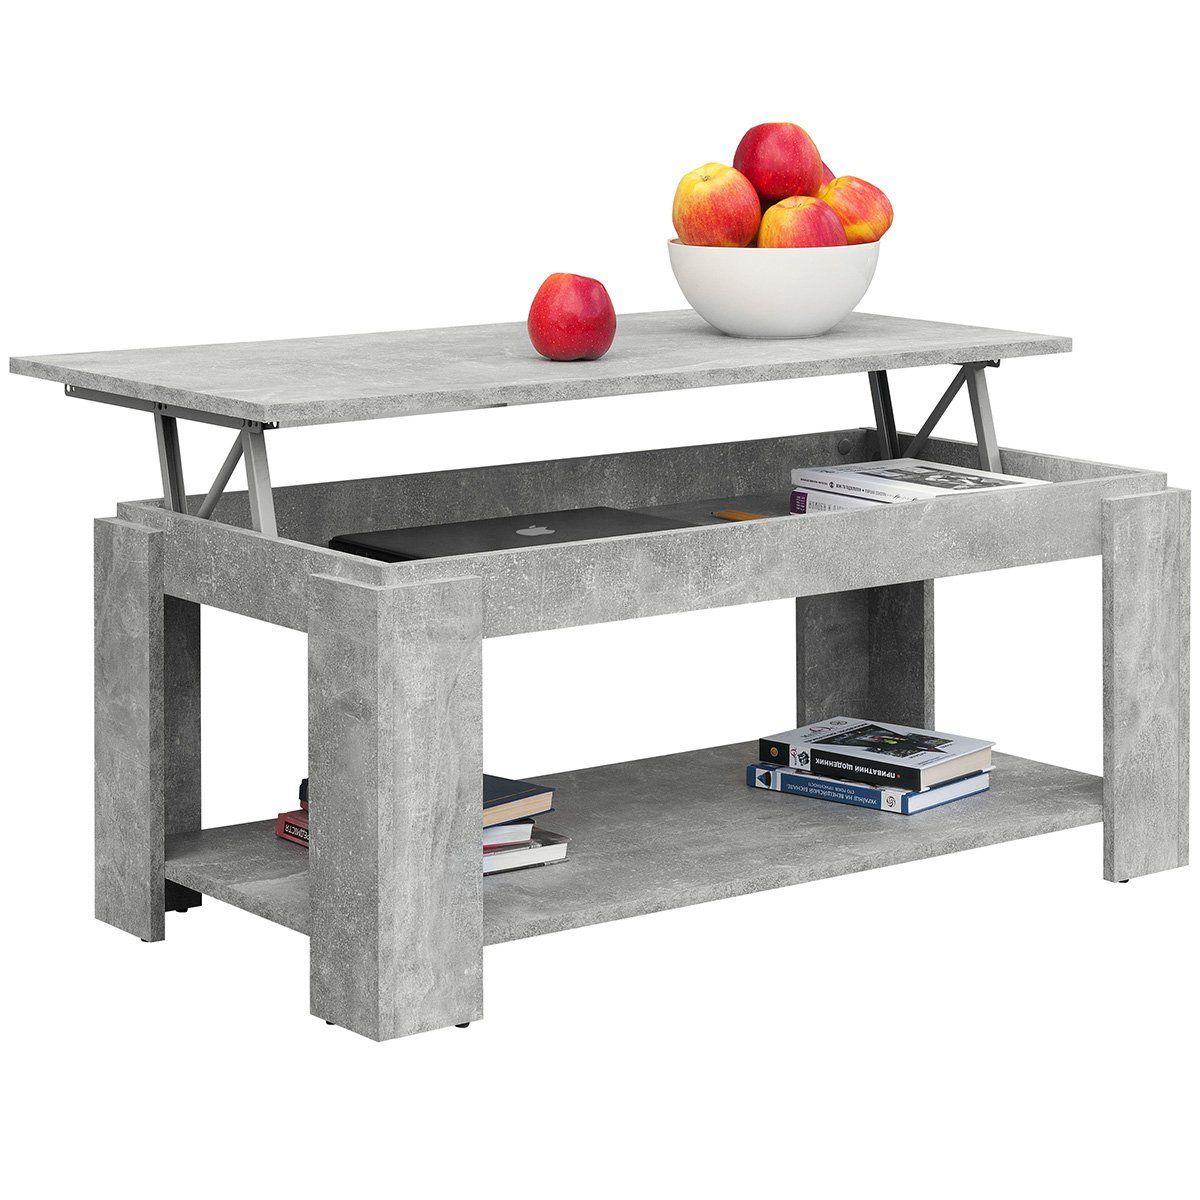 Table Basse Relevable Table Basse Relevable Table Basse Table Basse Moderne